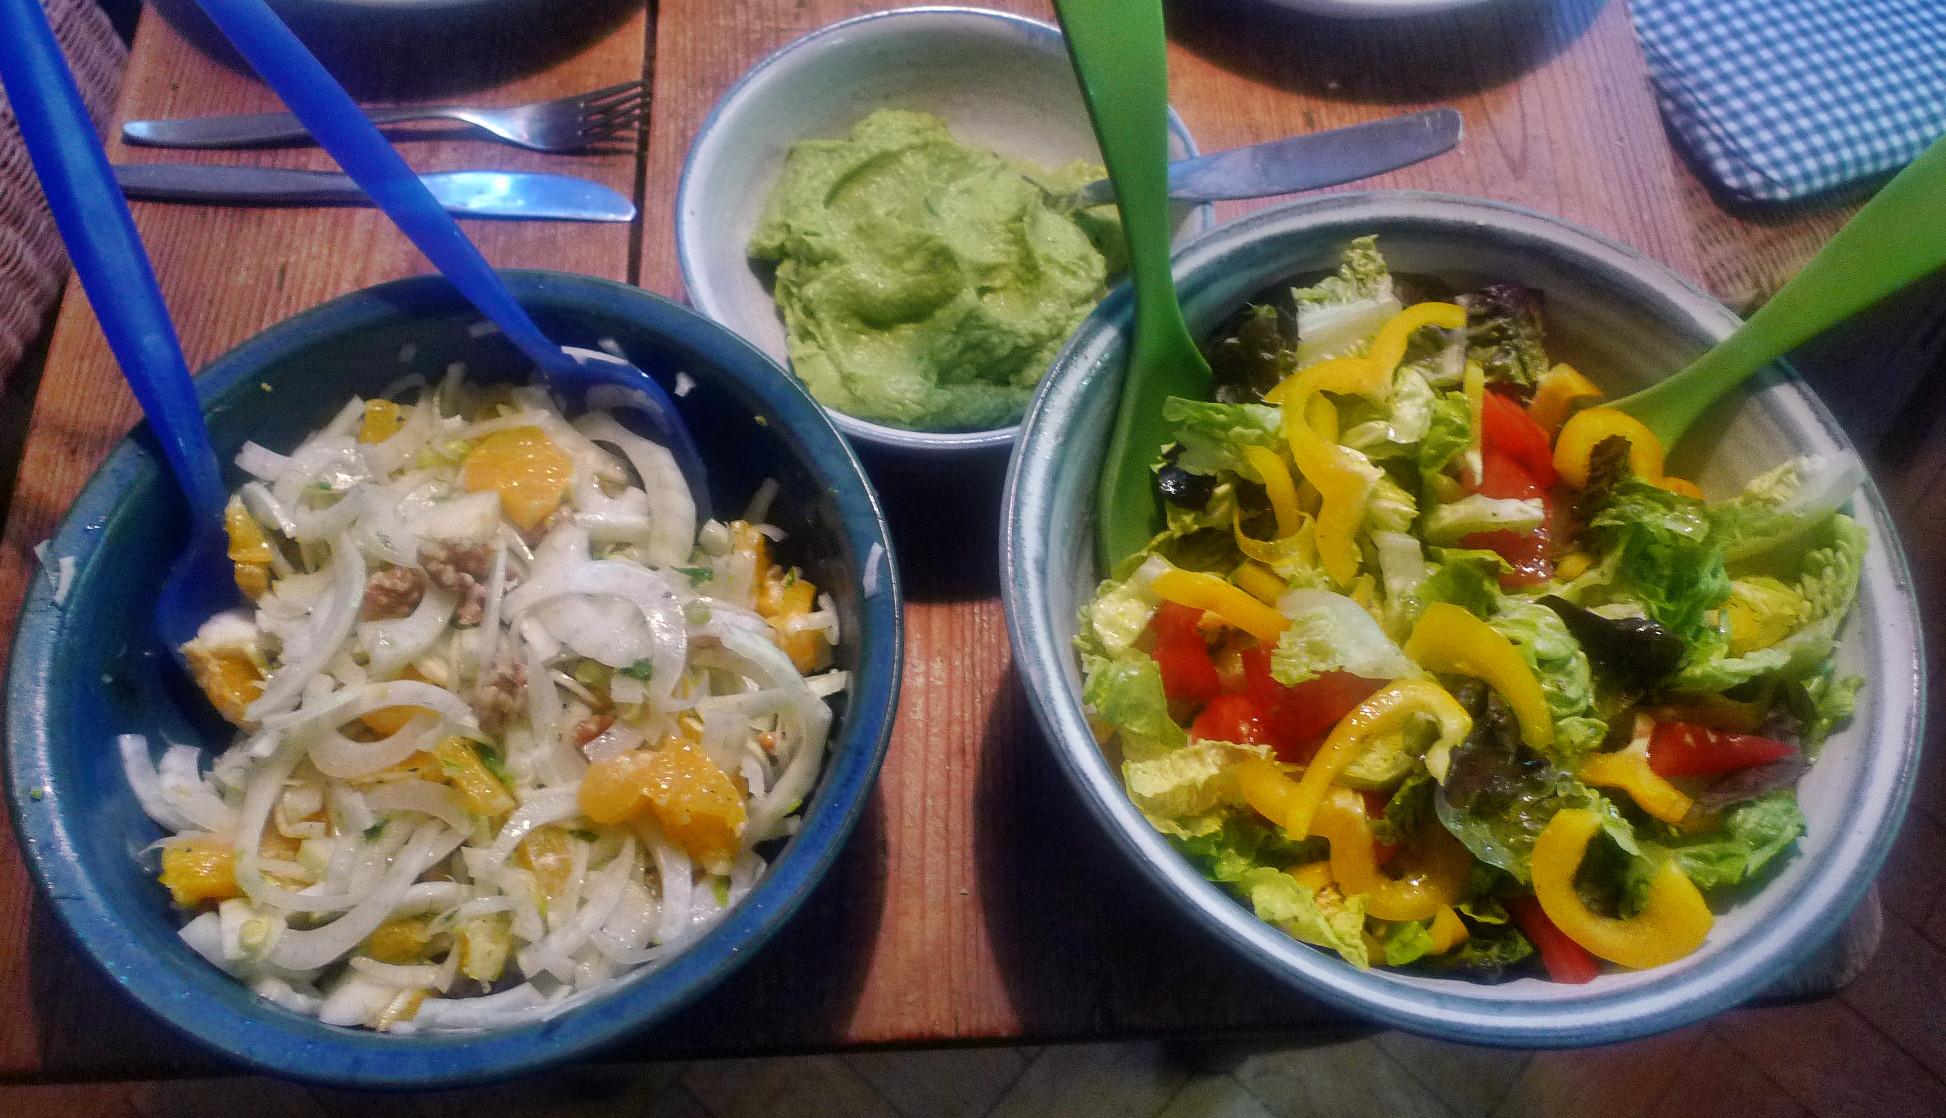 Guacamole,Fenchelsalat,Salat,Bratkartoffel--22.1.15   (9)